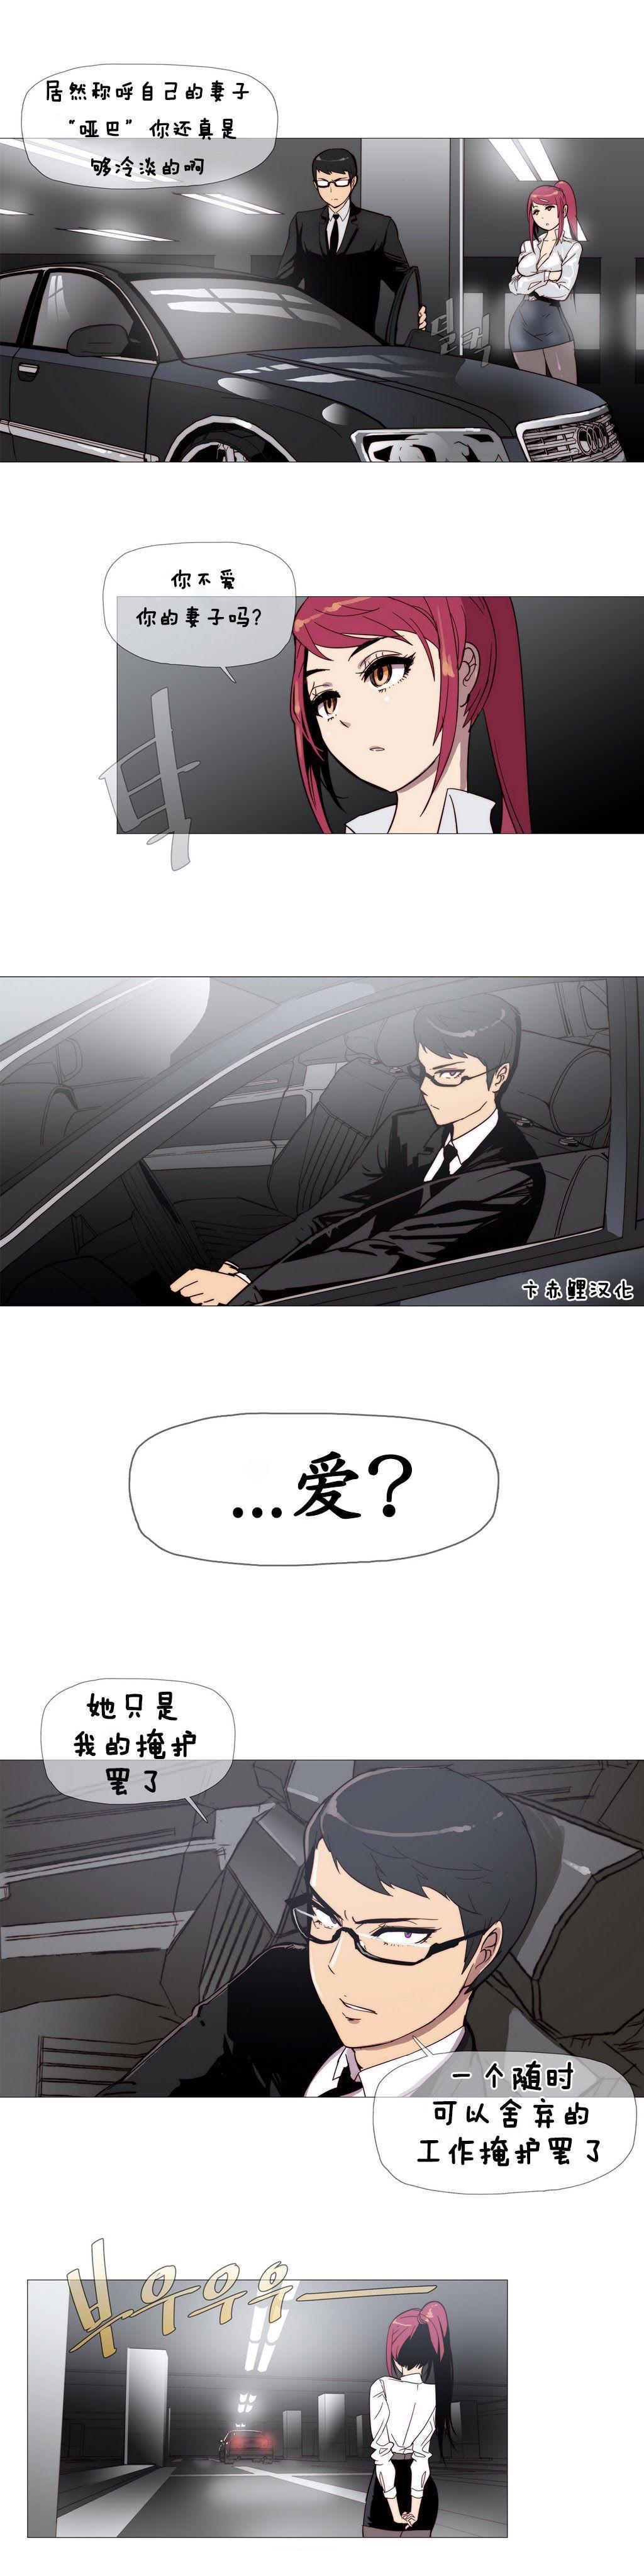 HouseHold Affairs 【卞赤鲤个人汉化】1~33话(持续更新中) 46